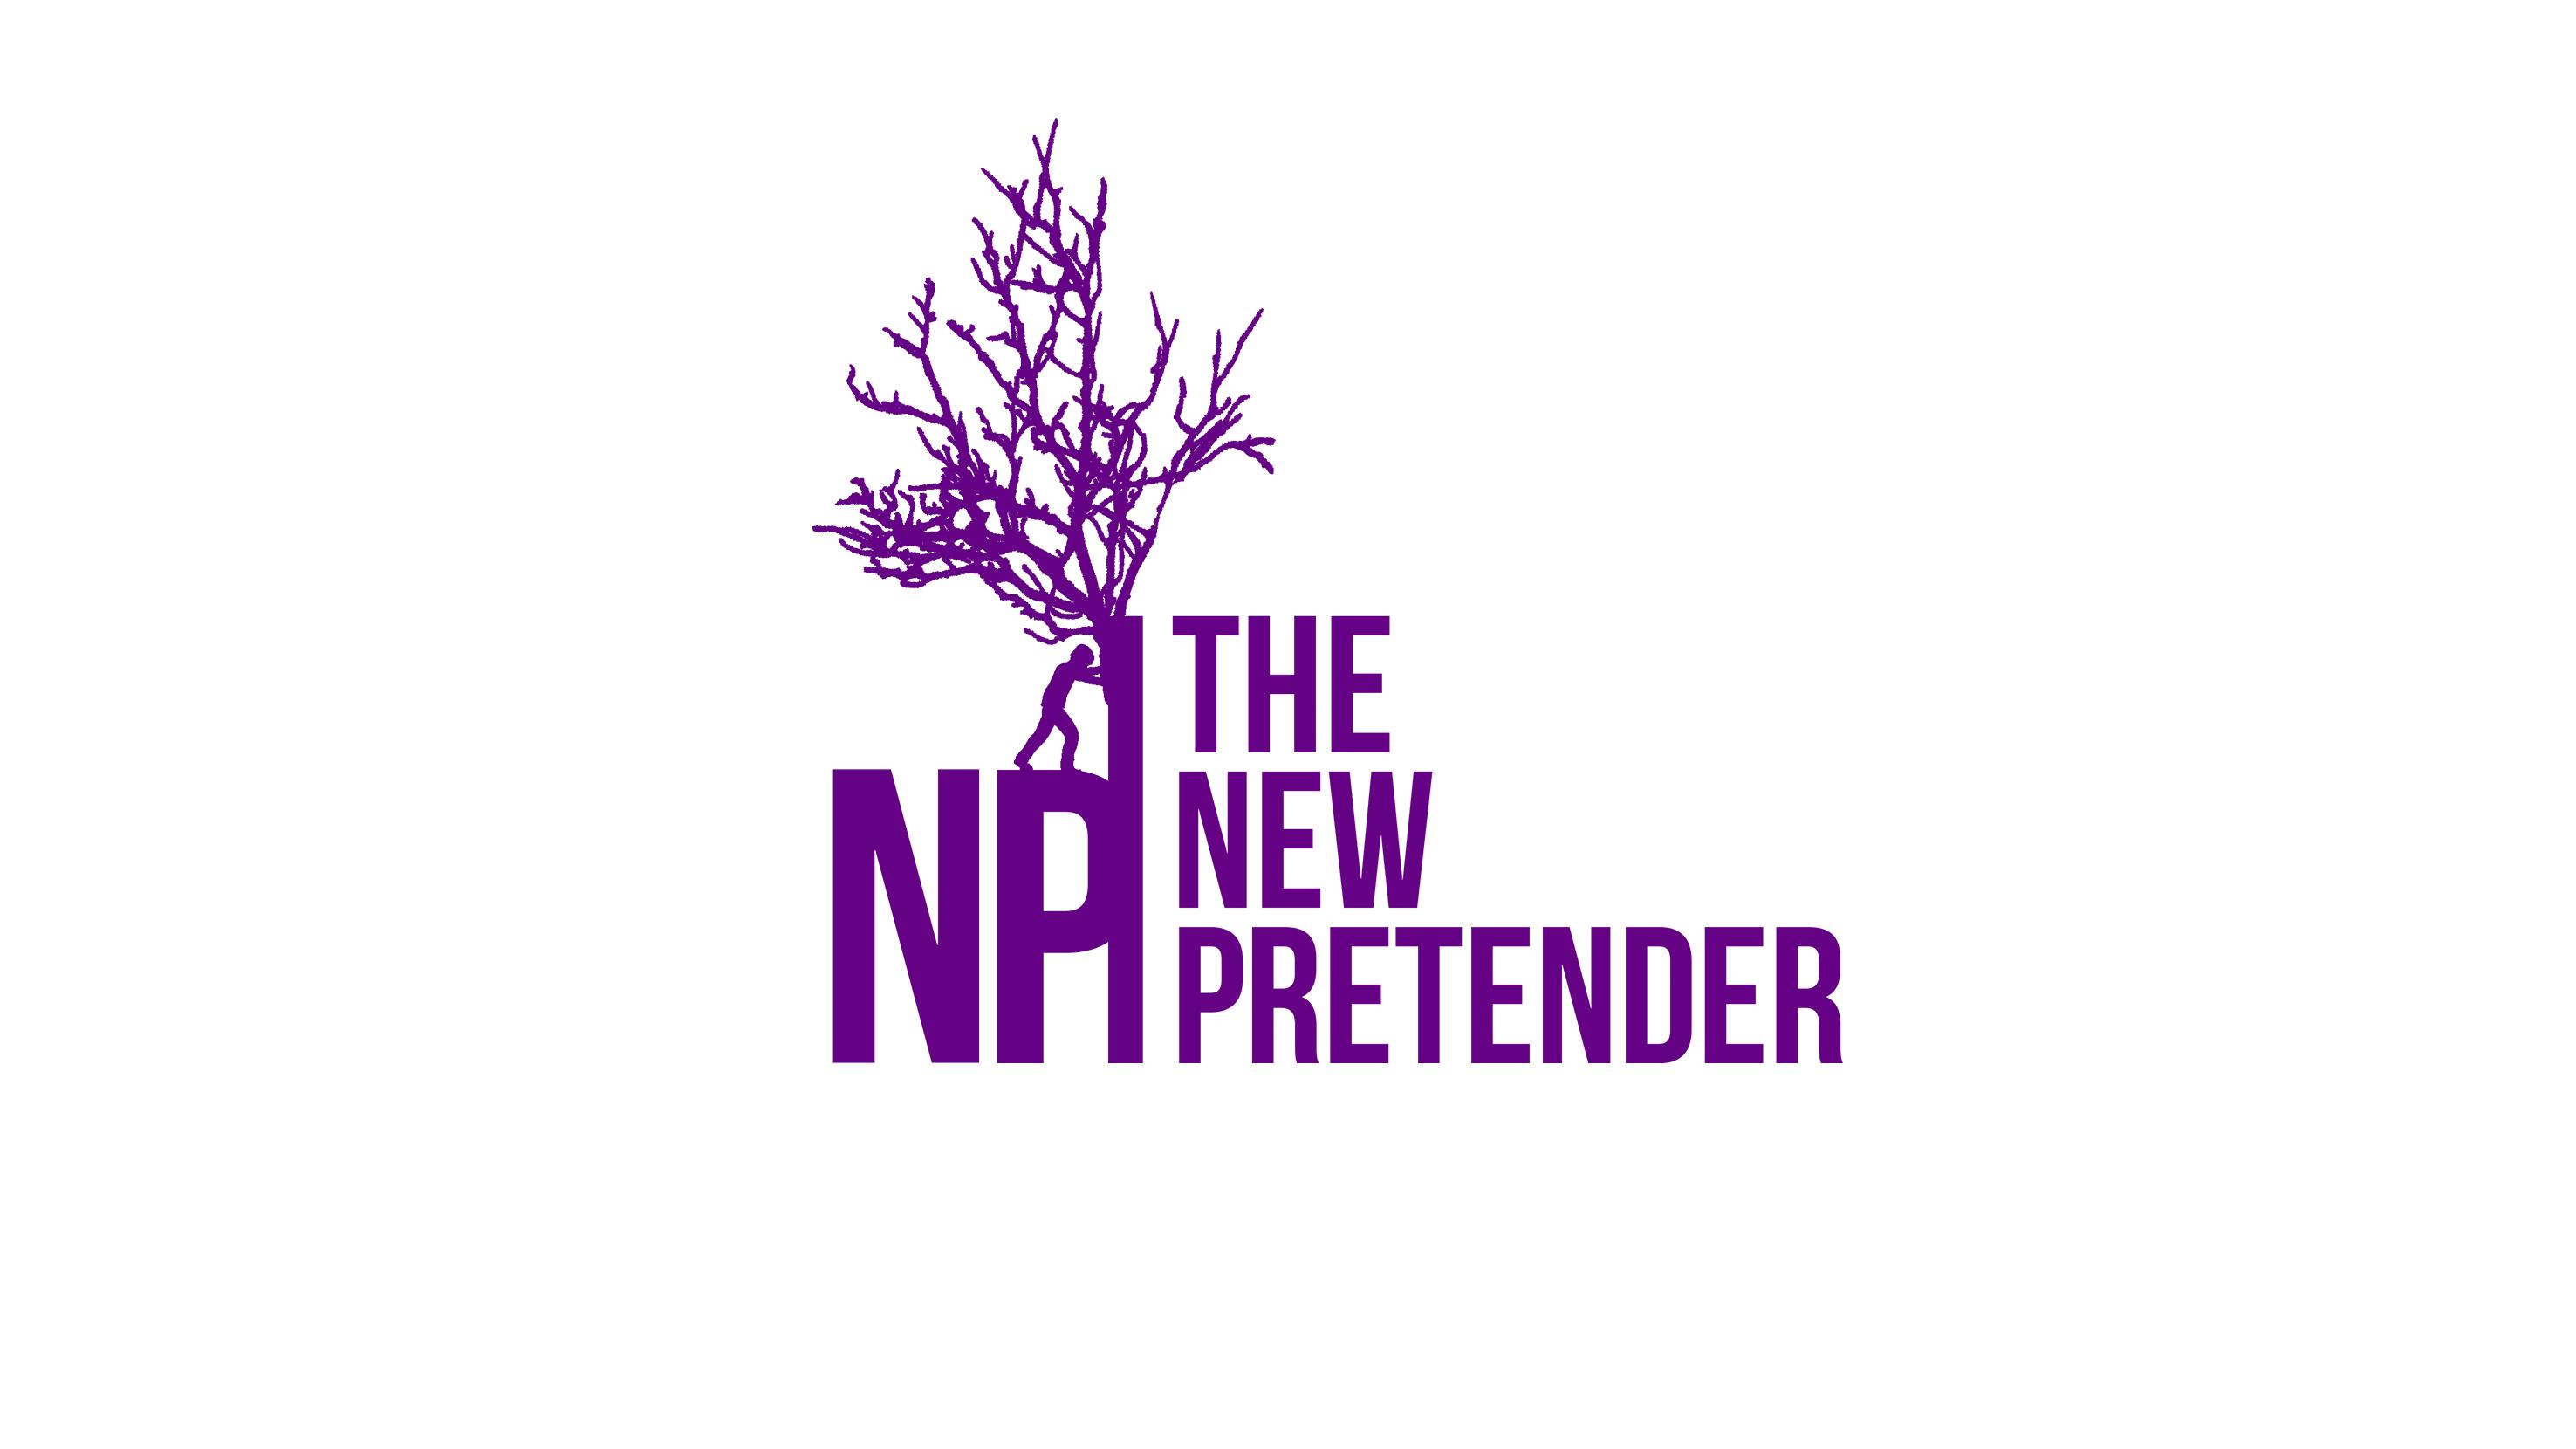 New Pretender